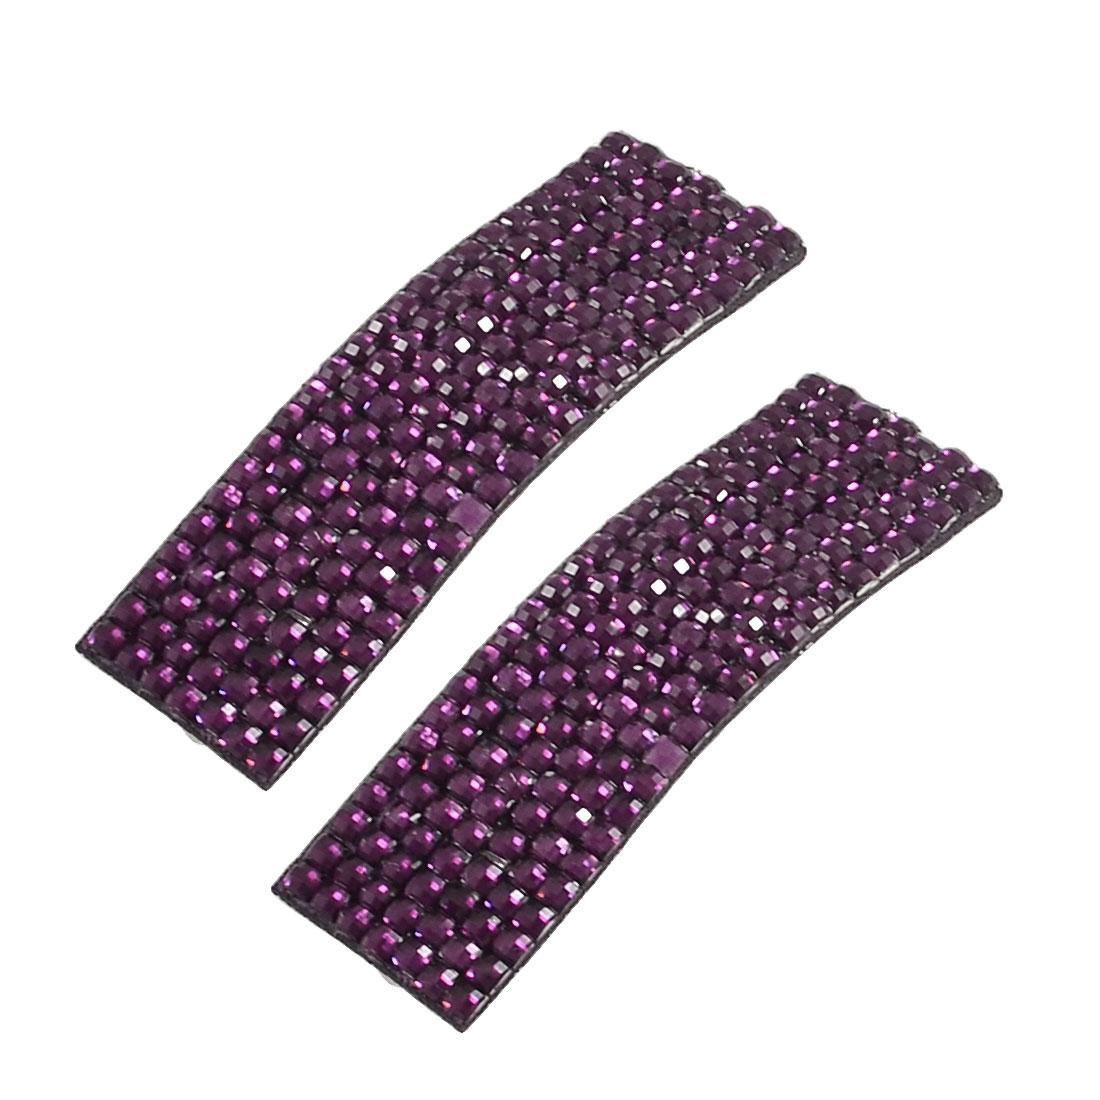 Lady Glittery Deep Purple Rhinestone Decoration Black Hair Clip Hairpin 2 Pieces